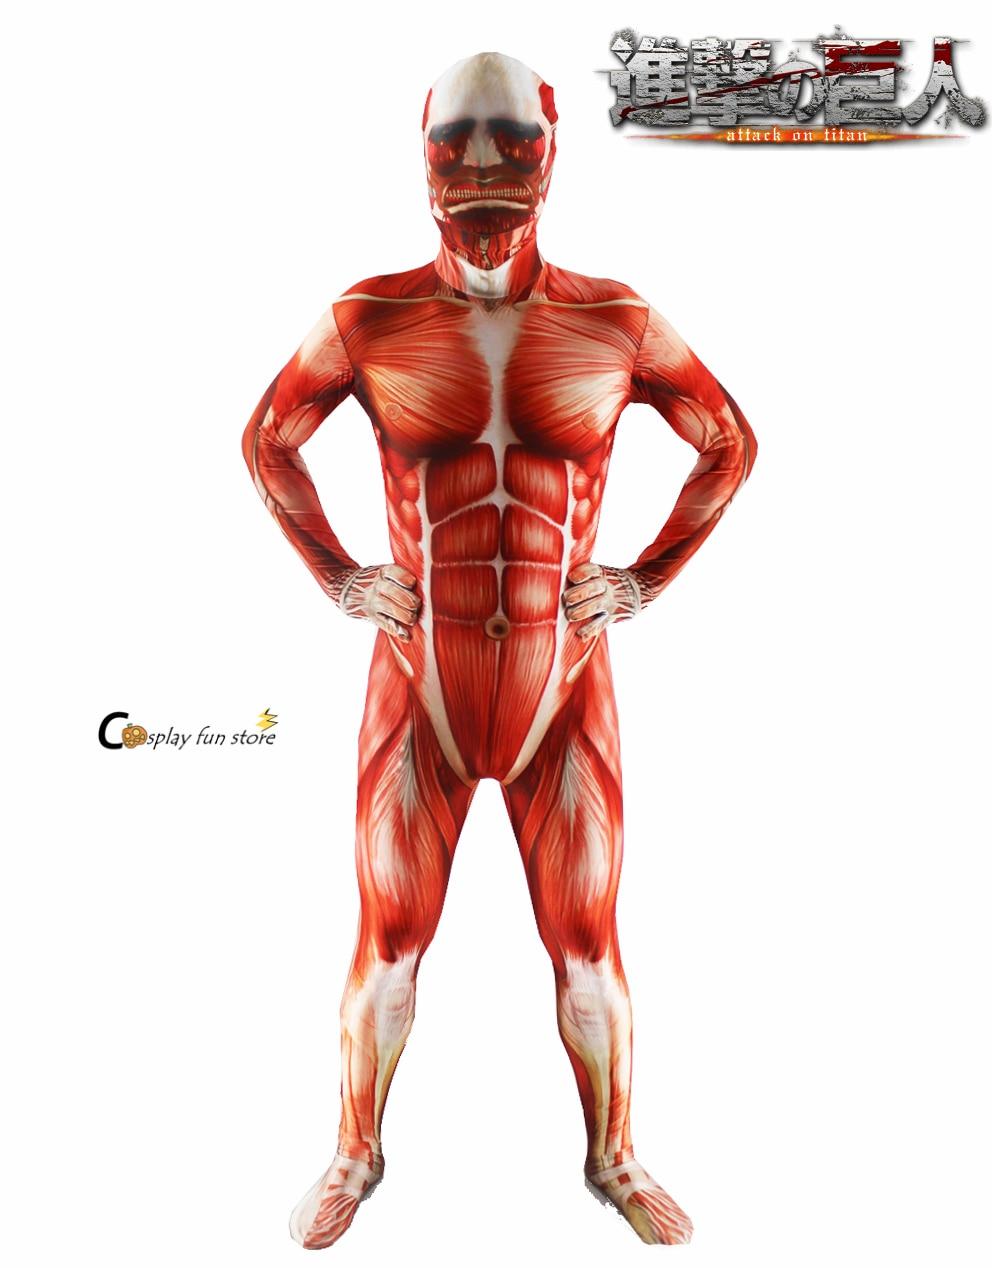 Ataque a titan cosplay Shingeki não cosplay Kyojin Colossal Prop Justas Muscle Man trajes de halloween para homens adultos zentai